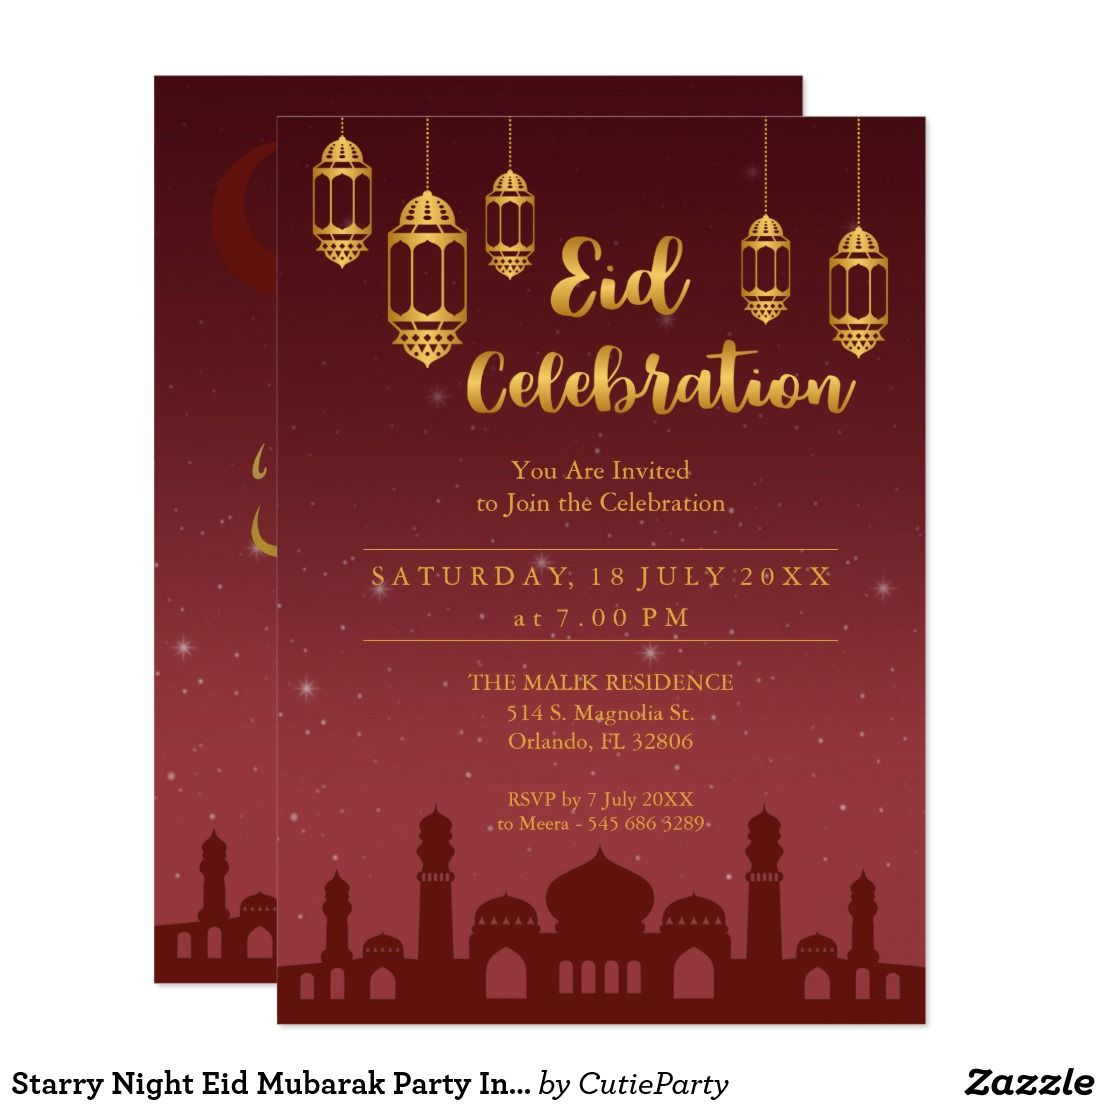 Starry Night Eid Mubarak Party Invitation | Pinterest | Eid mubarak